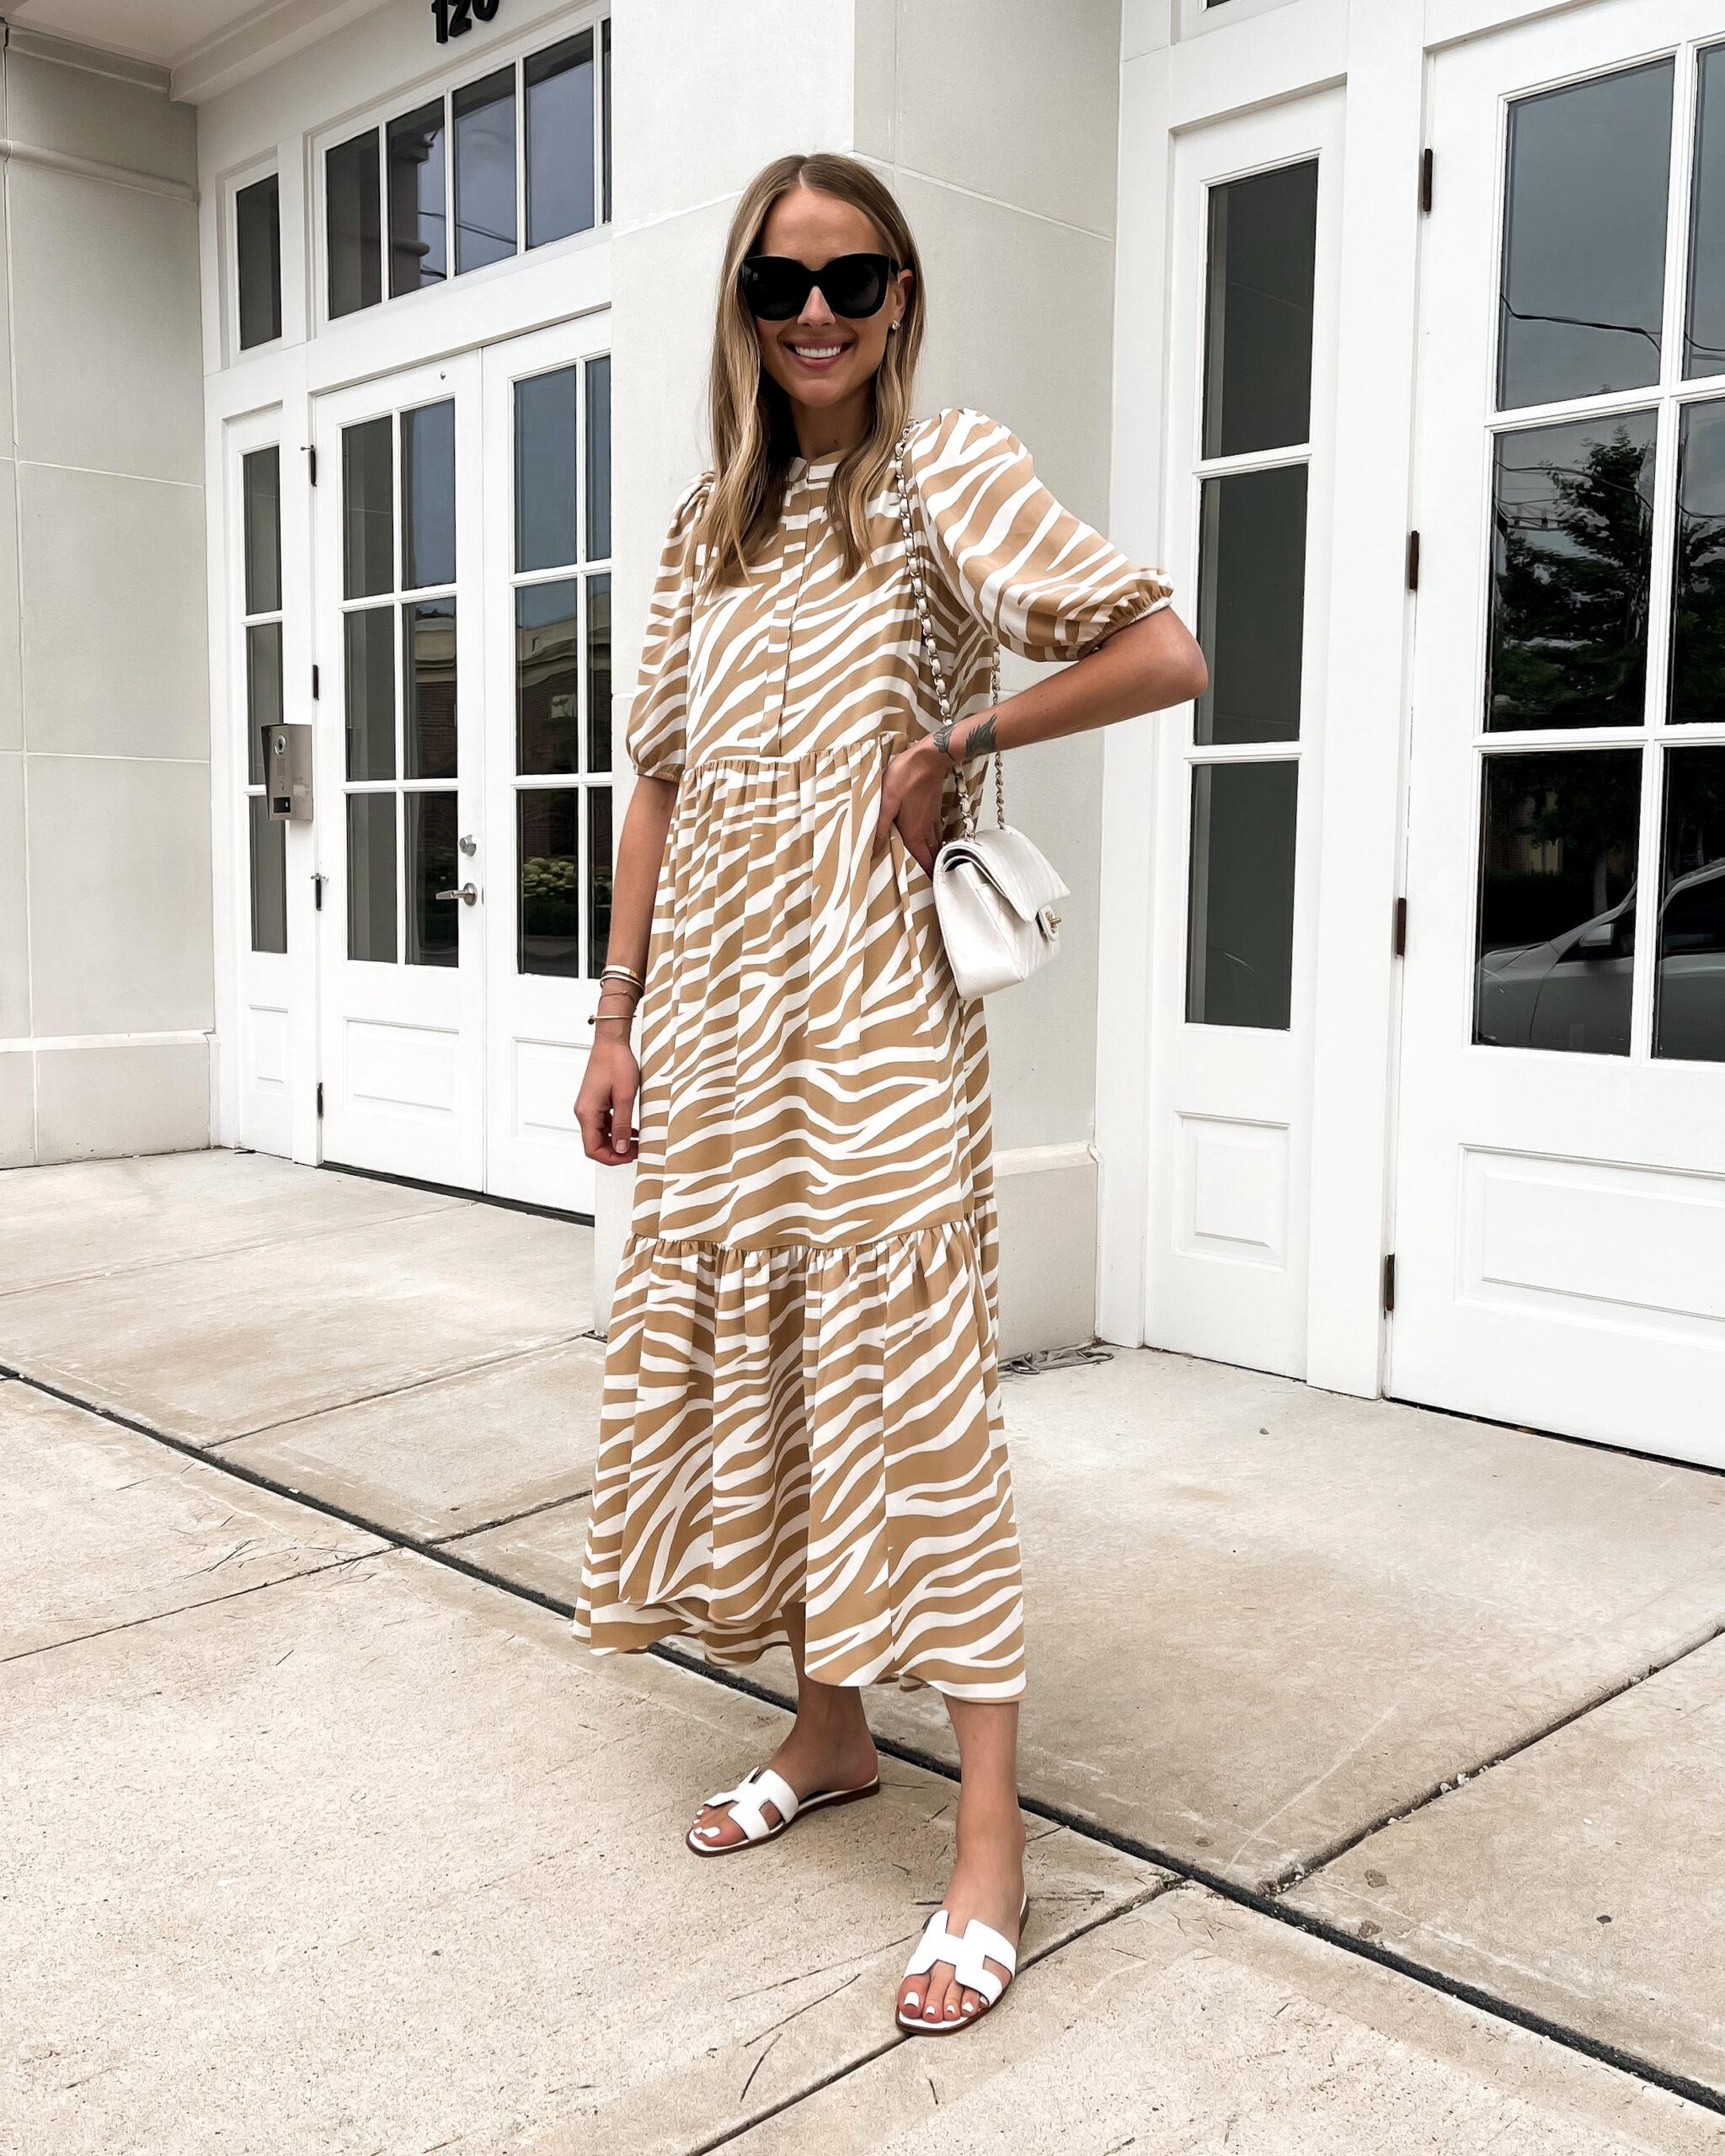 Fashion Jackson Wearing Maxi Beige Zebra Print Dress White Hermes Sandals White Chanel Handbag Summer Dress Outfit